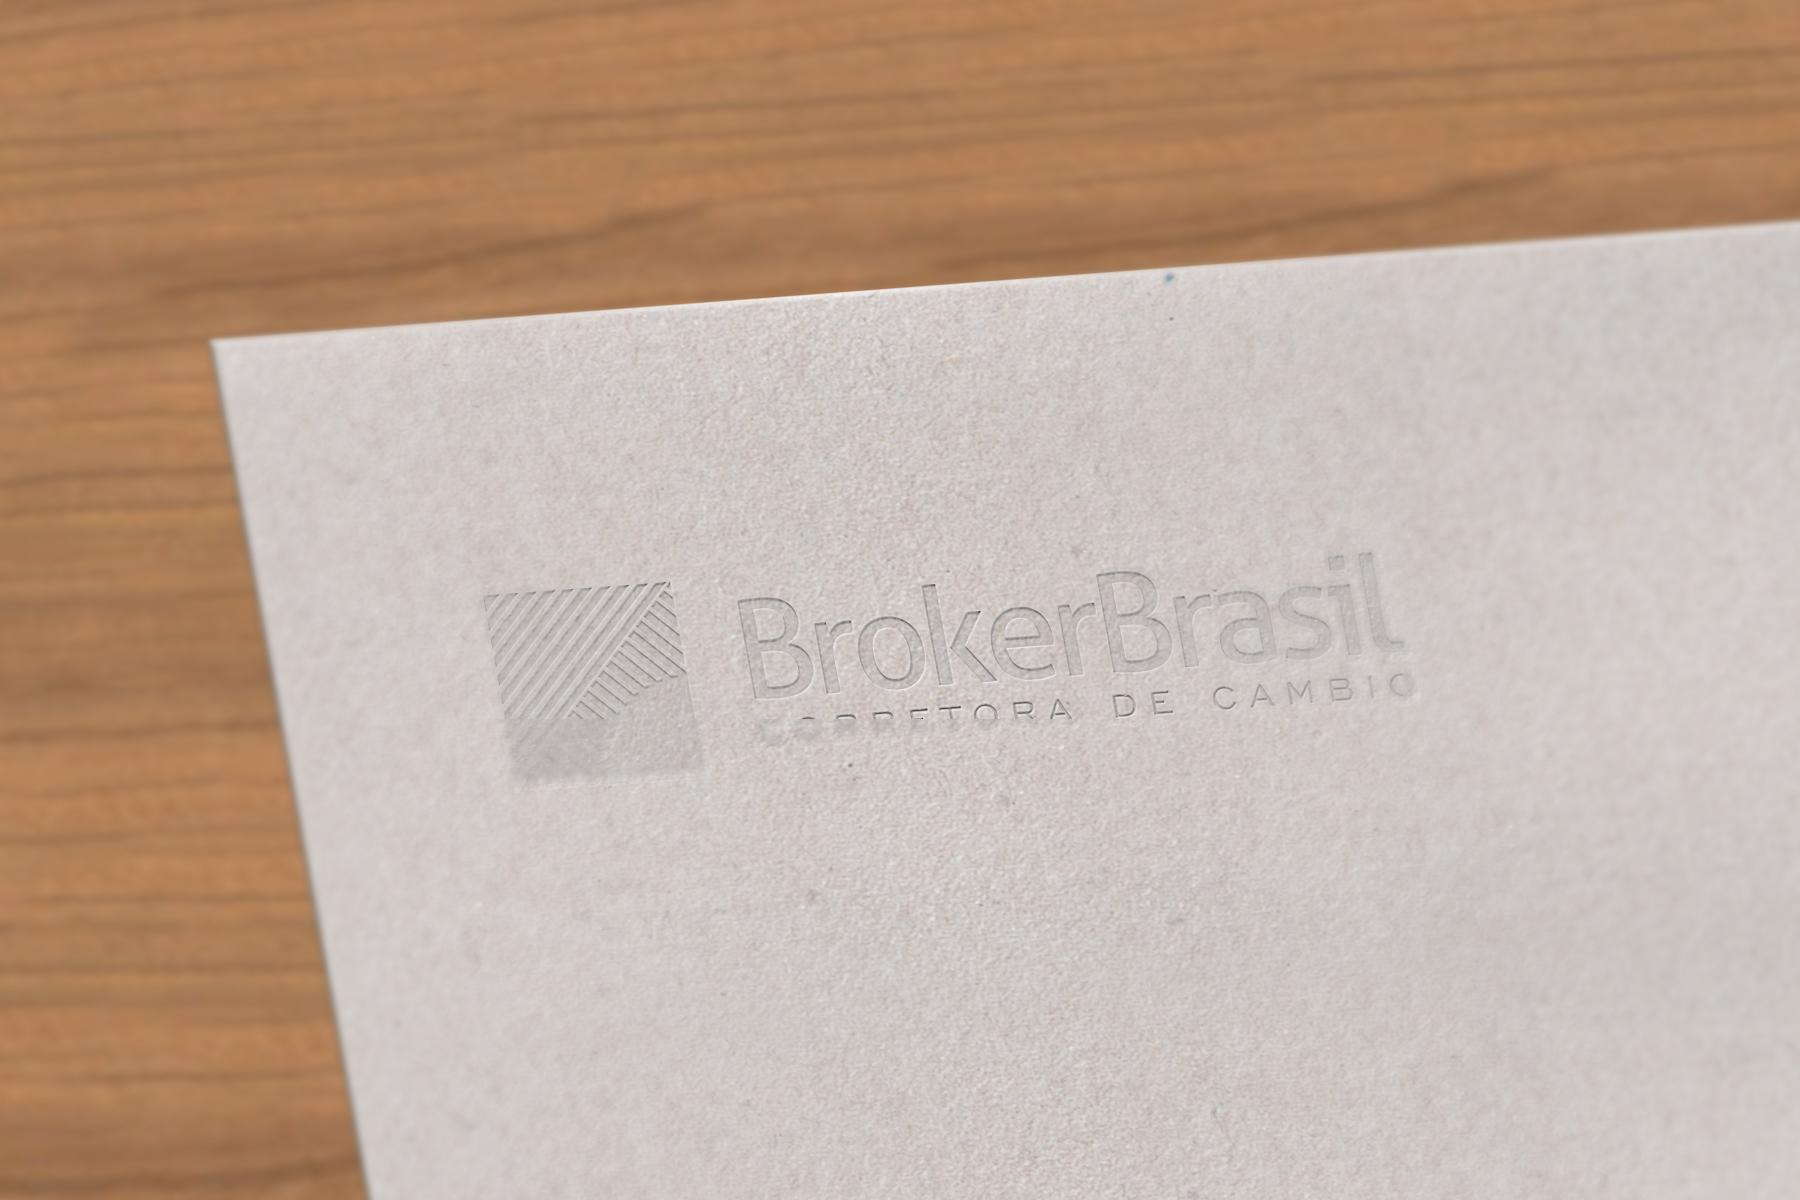 moo_design_broker_brasil_4